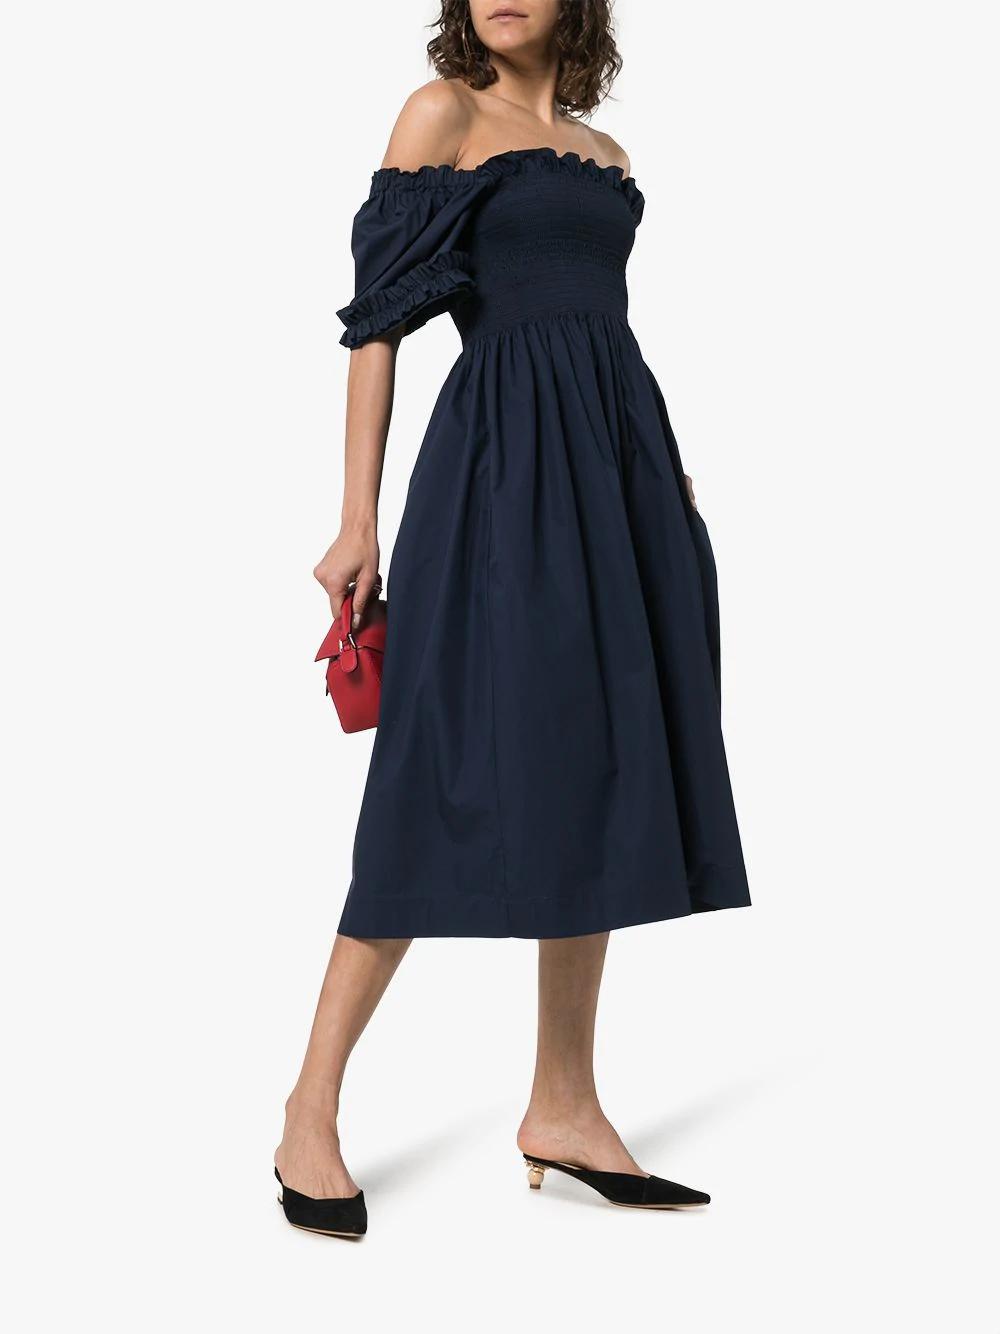 425e0c04c2293 Molly Goddard Adelaide Off-Shoulder Smocked Cotton Dress In Navy ...